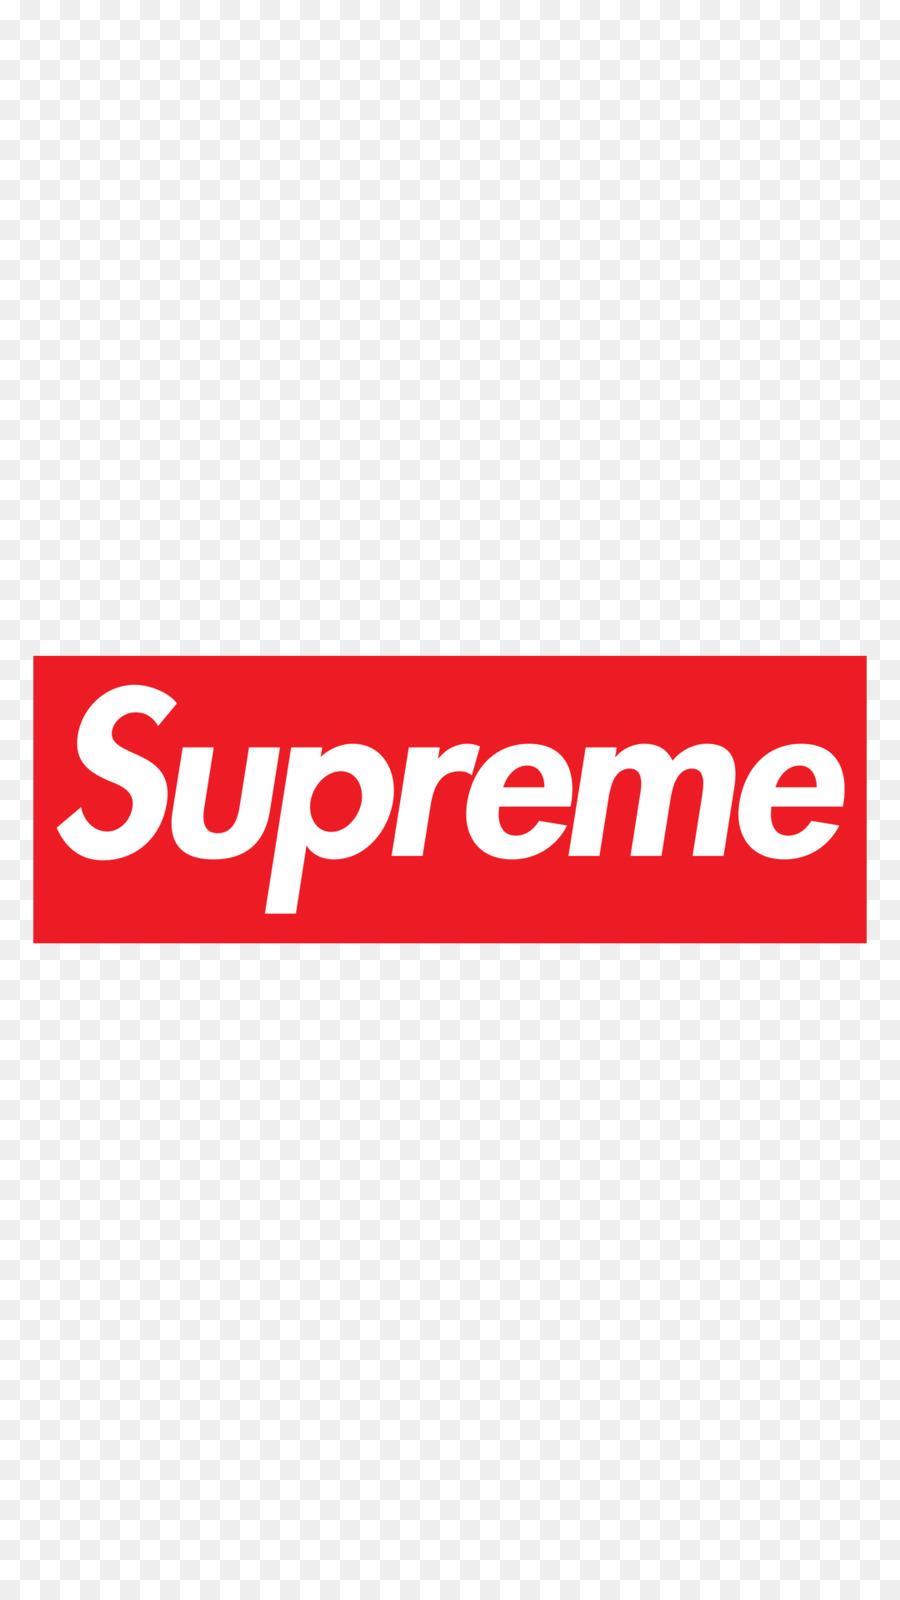 supreme t shirt logo new york city sticker supreme png download rh kisspng com supreme logo font maker supreme logo font maker